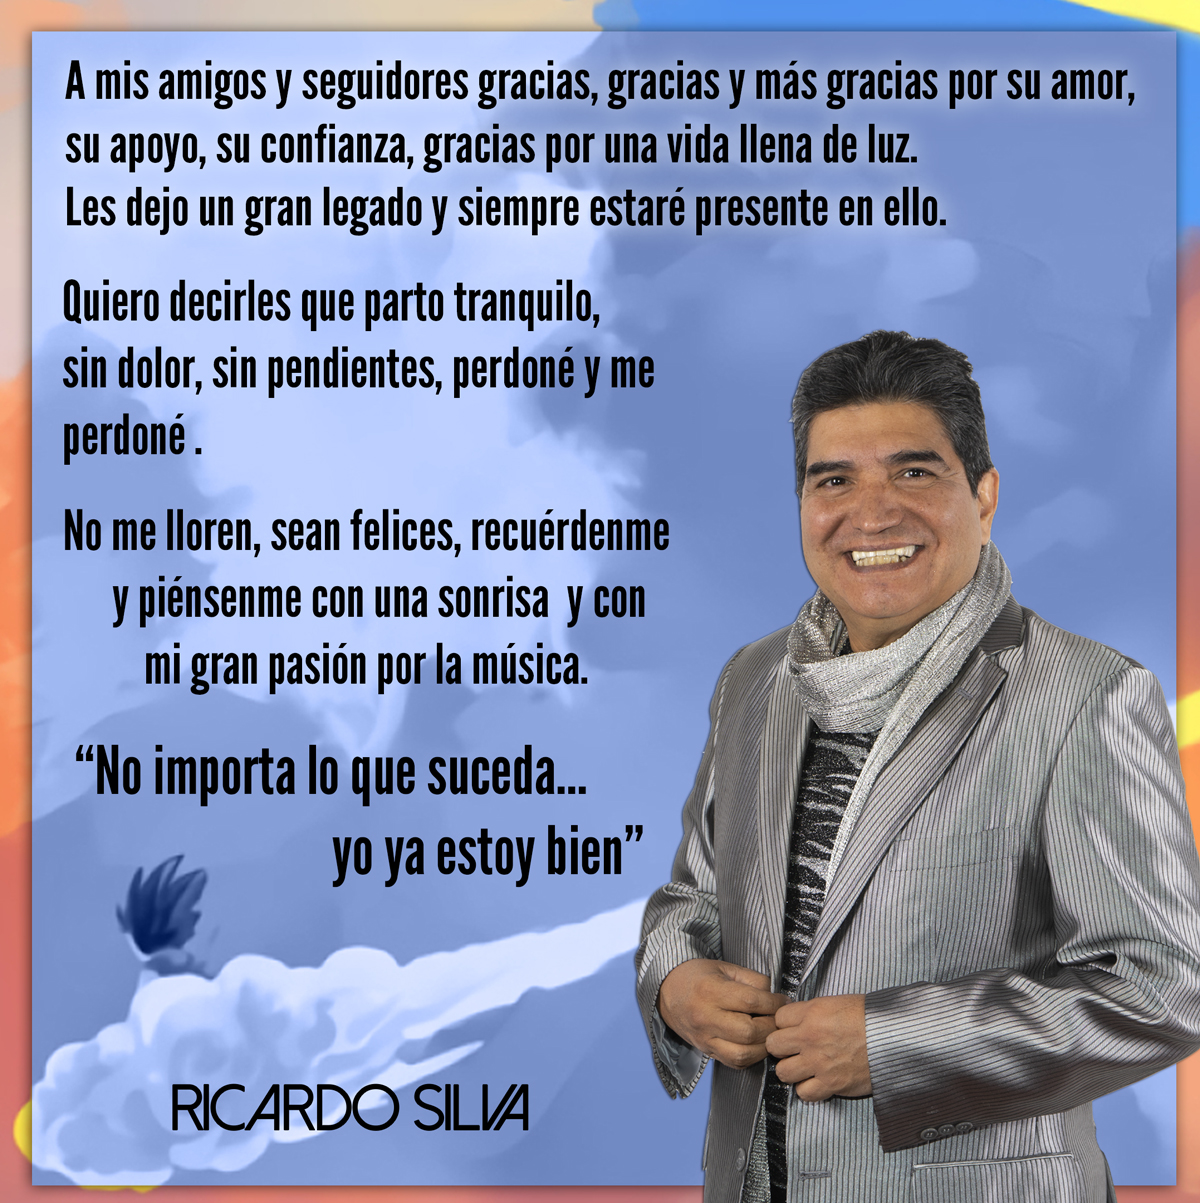 ricardo Silva mensaje